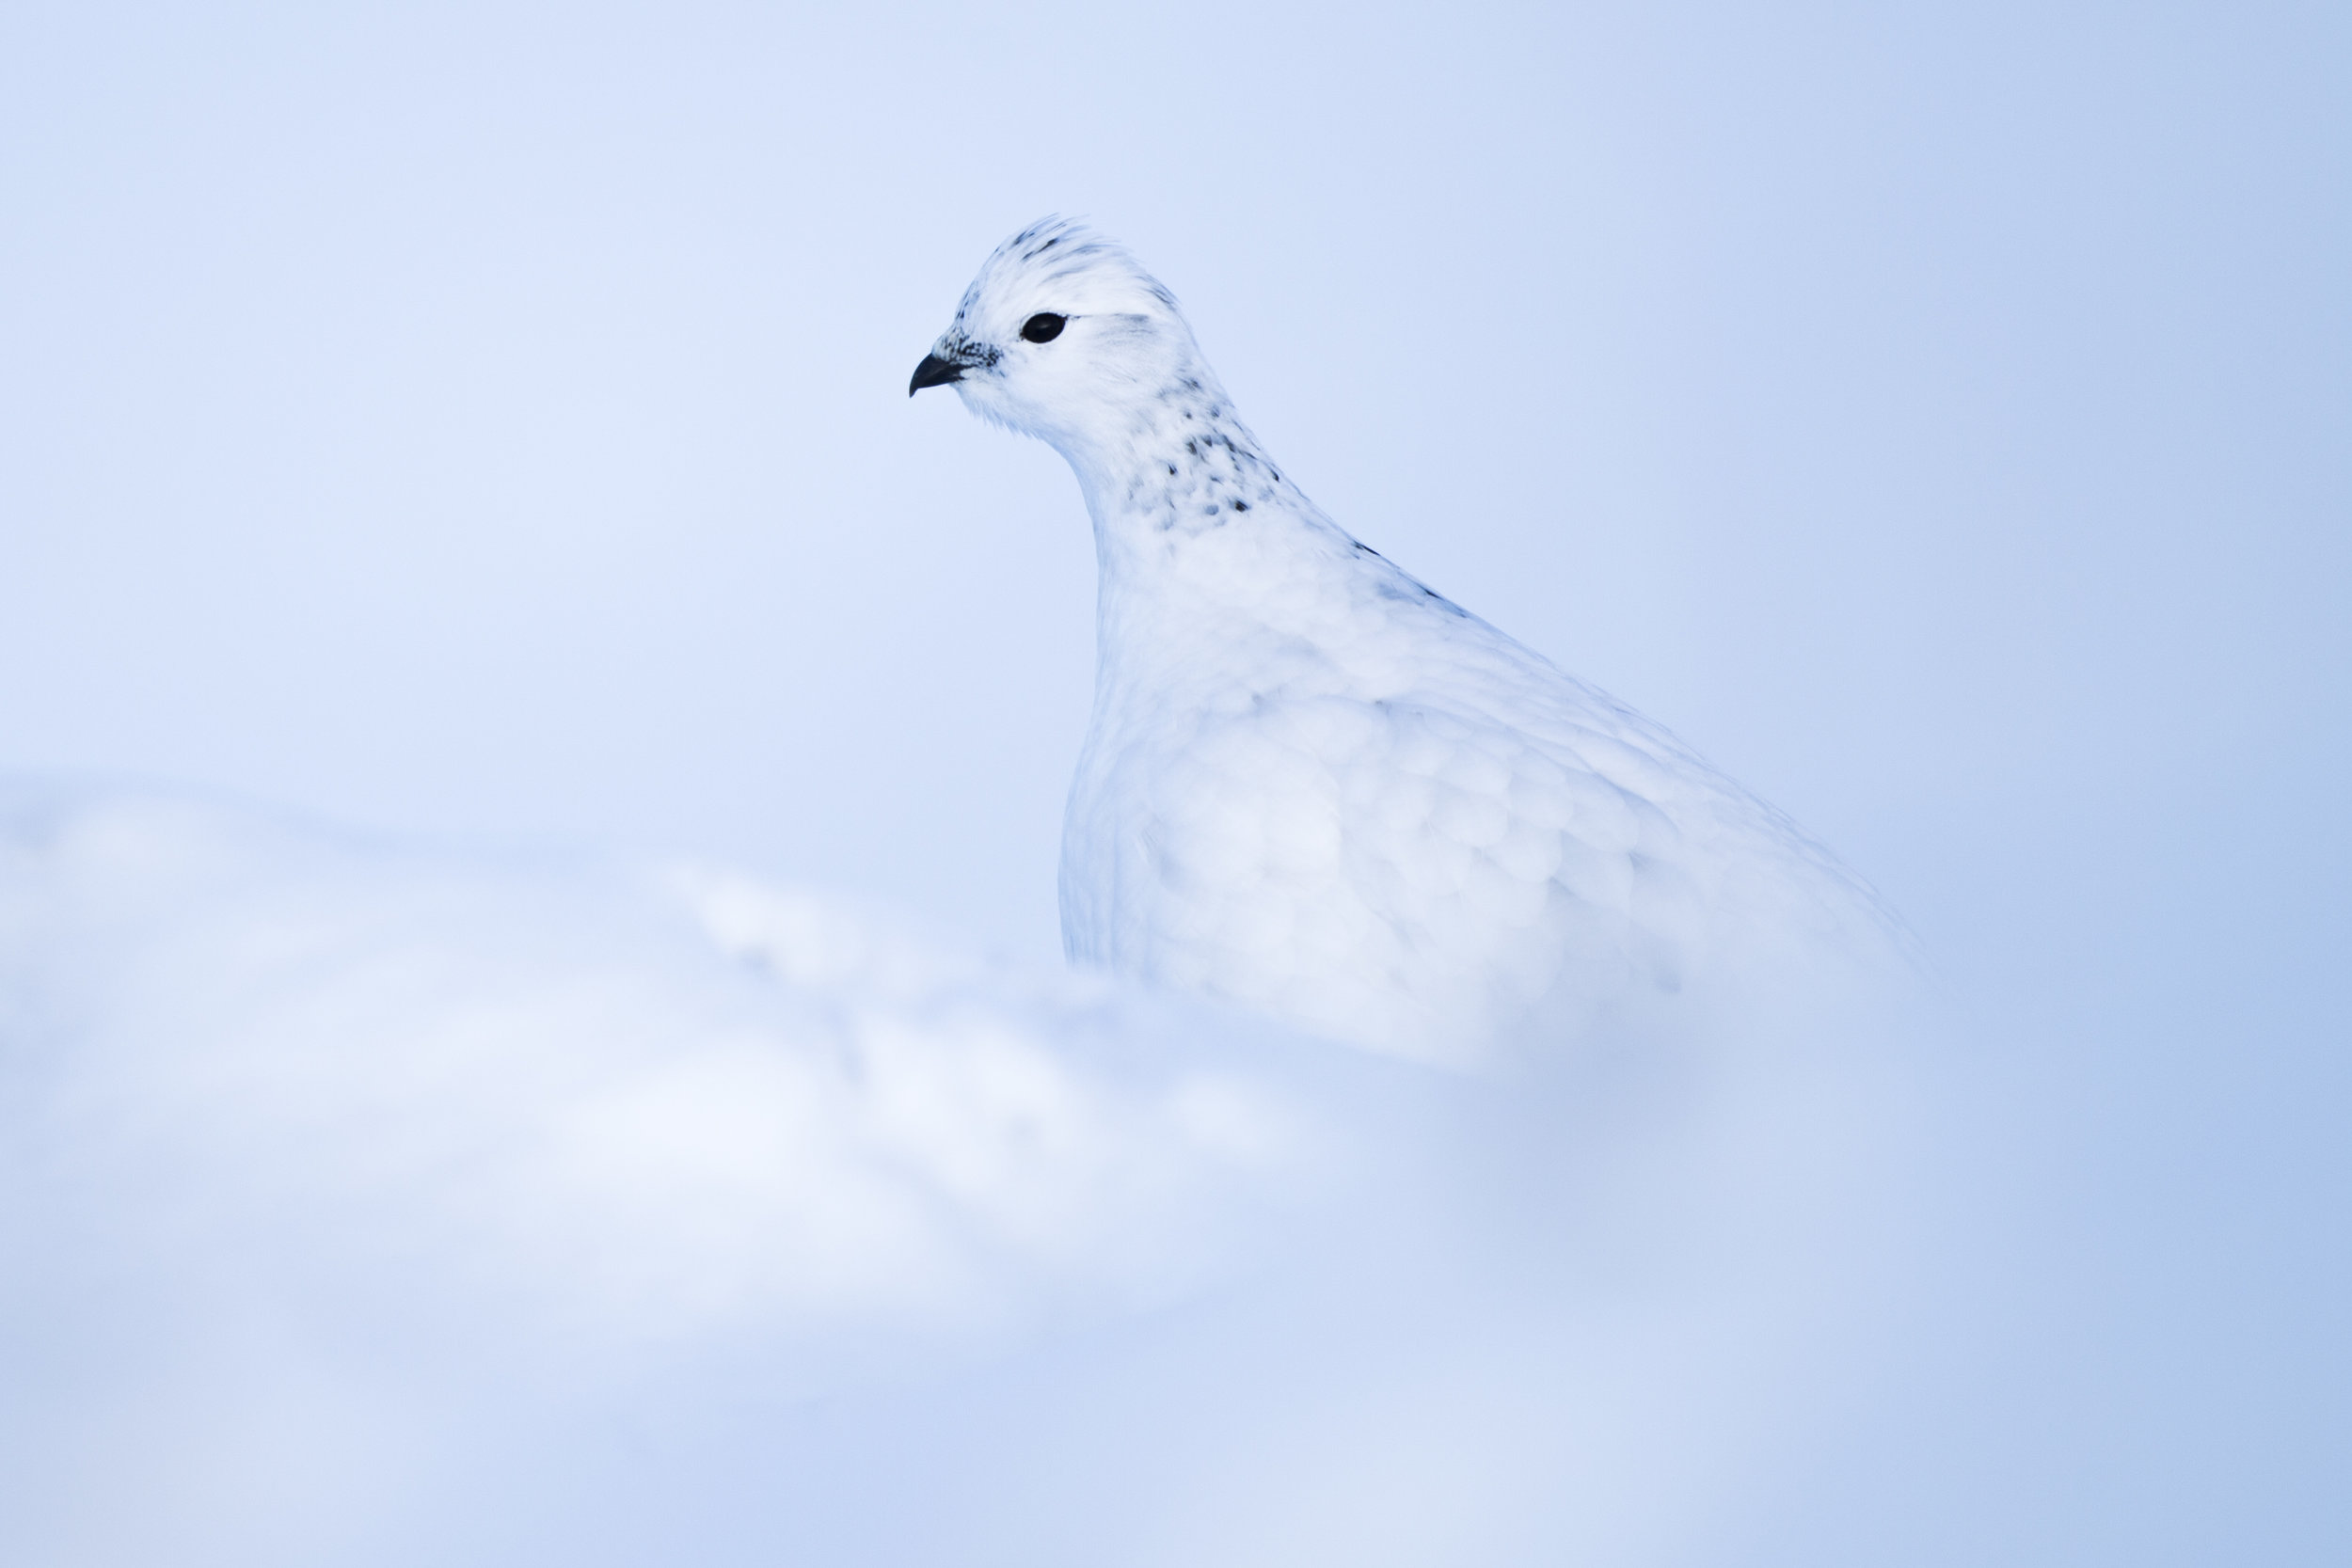 A ptarmigan amongst the snow.